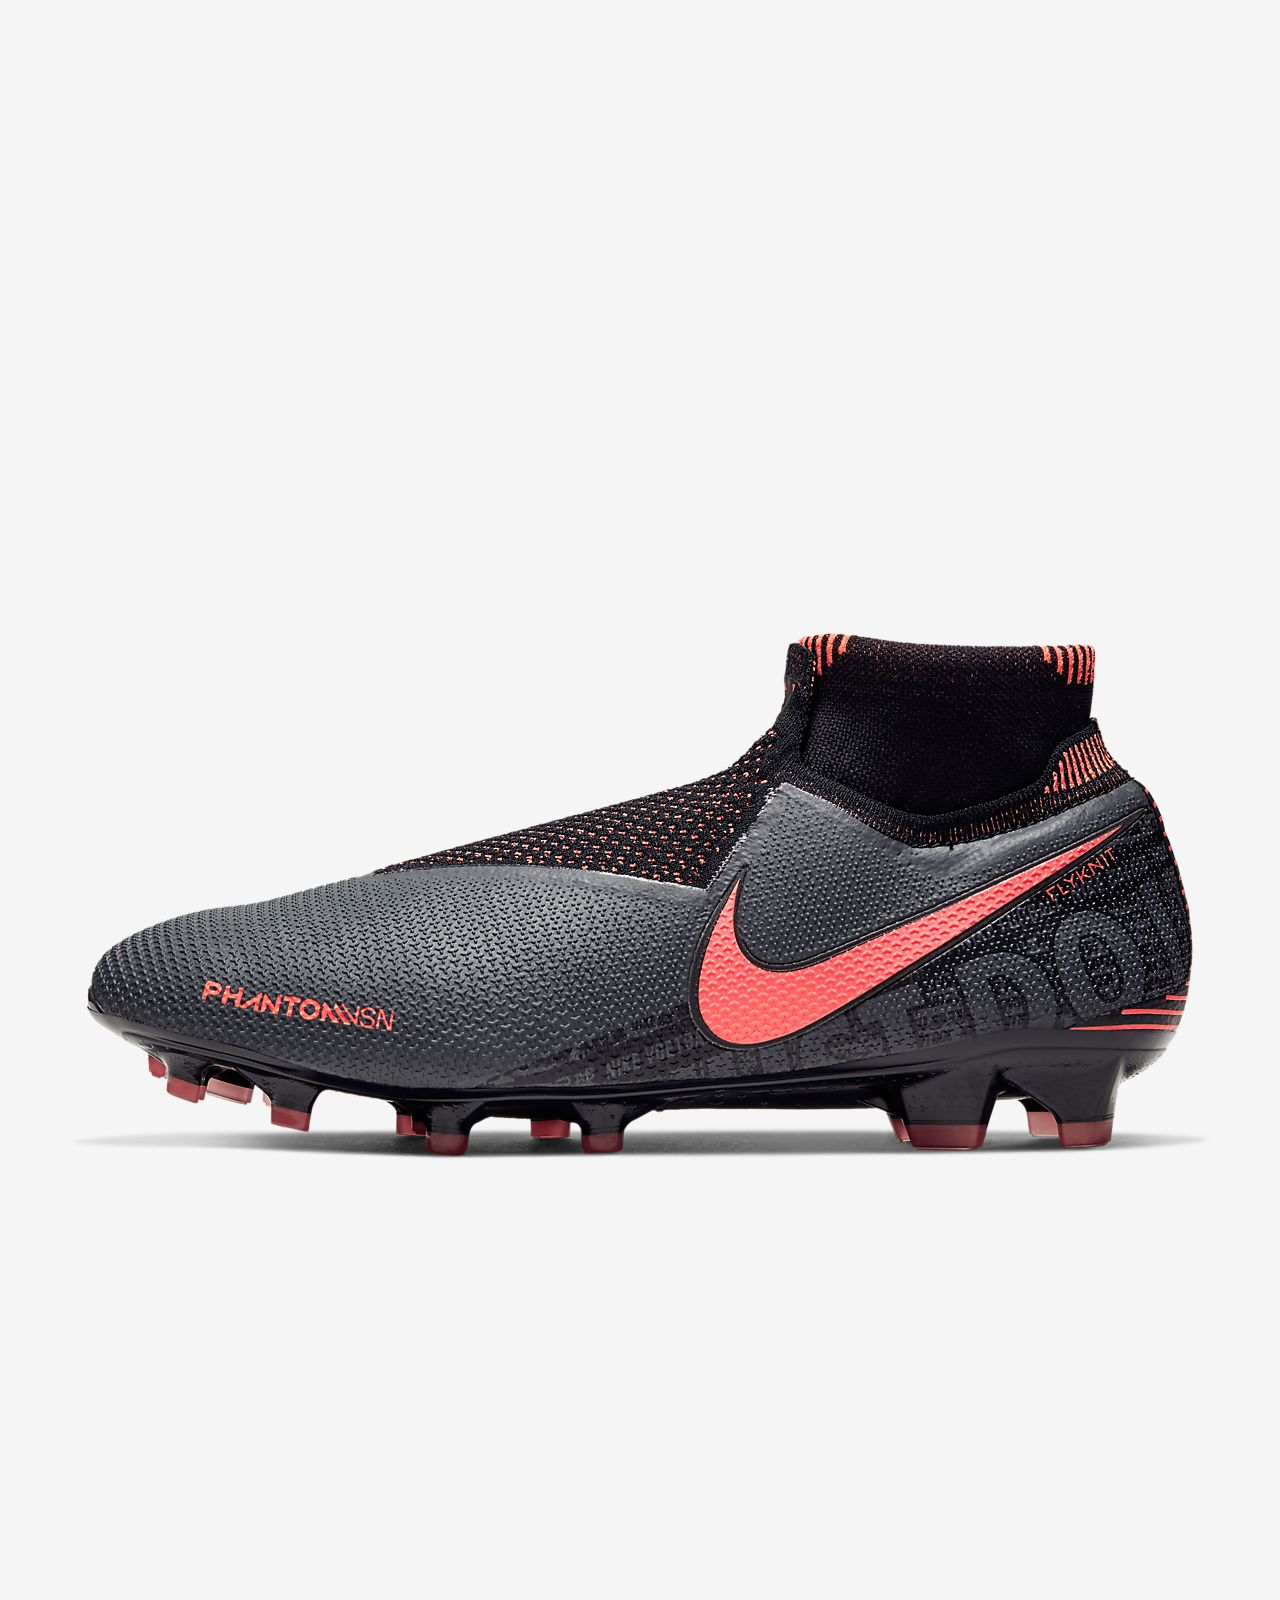 nike fotbollsskor superfly billigt, Populära Brand Nike Air